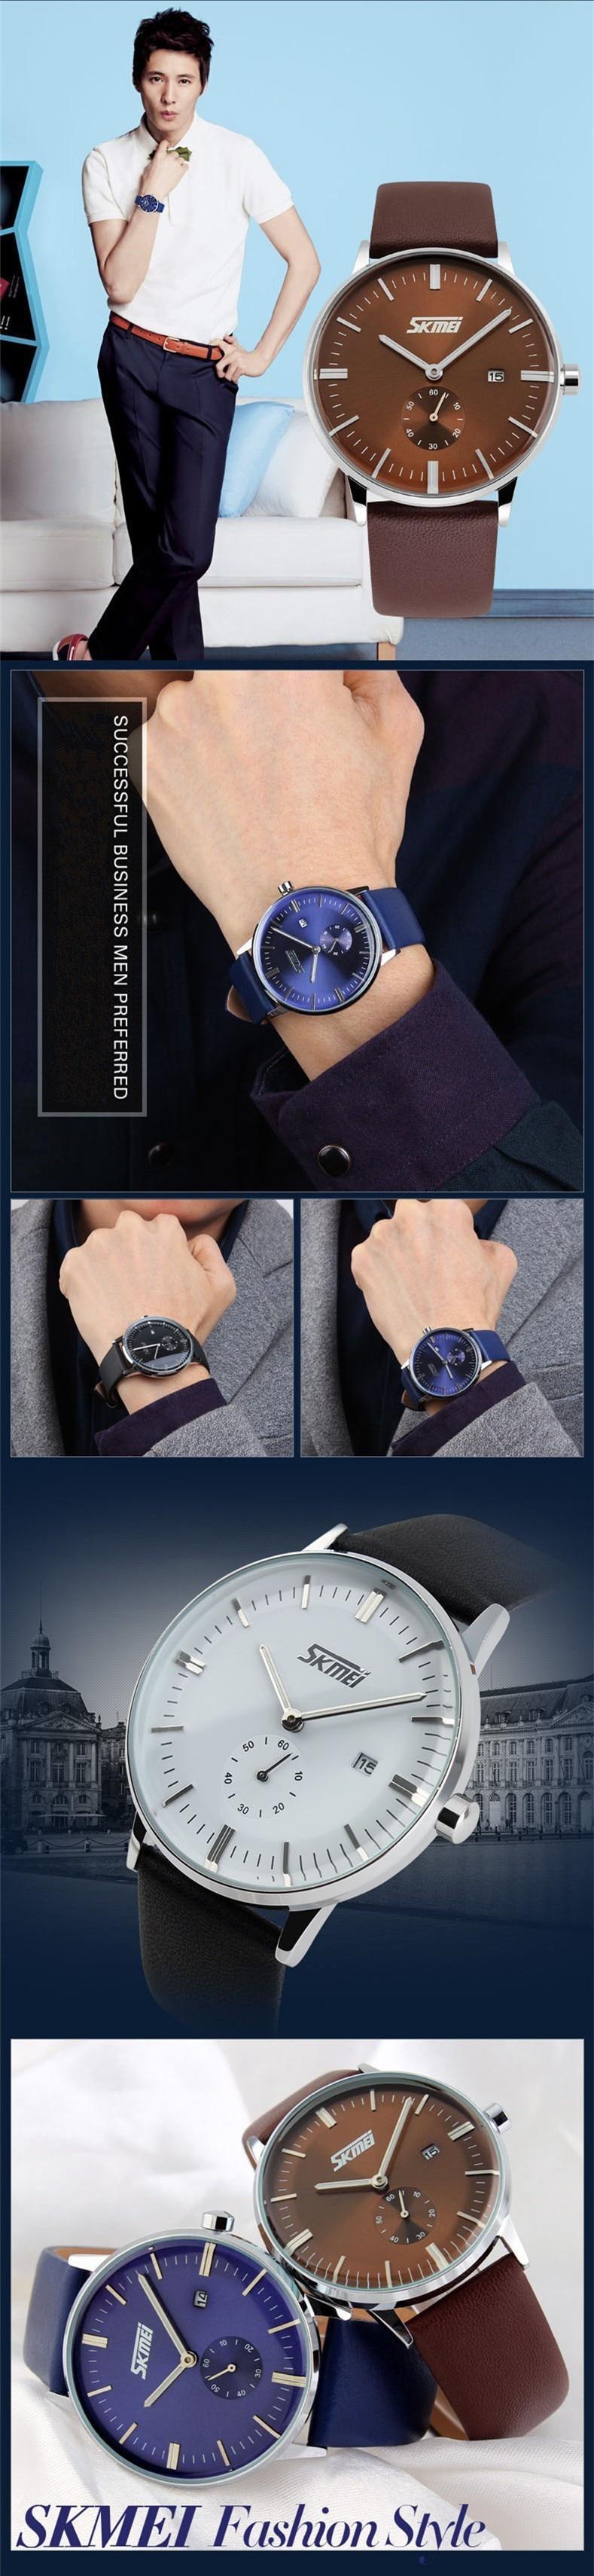 SKMEI 9083 Leather Strap Quartz Watch 1